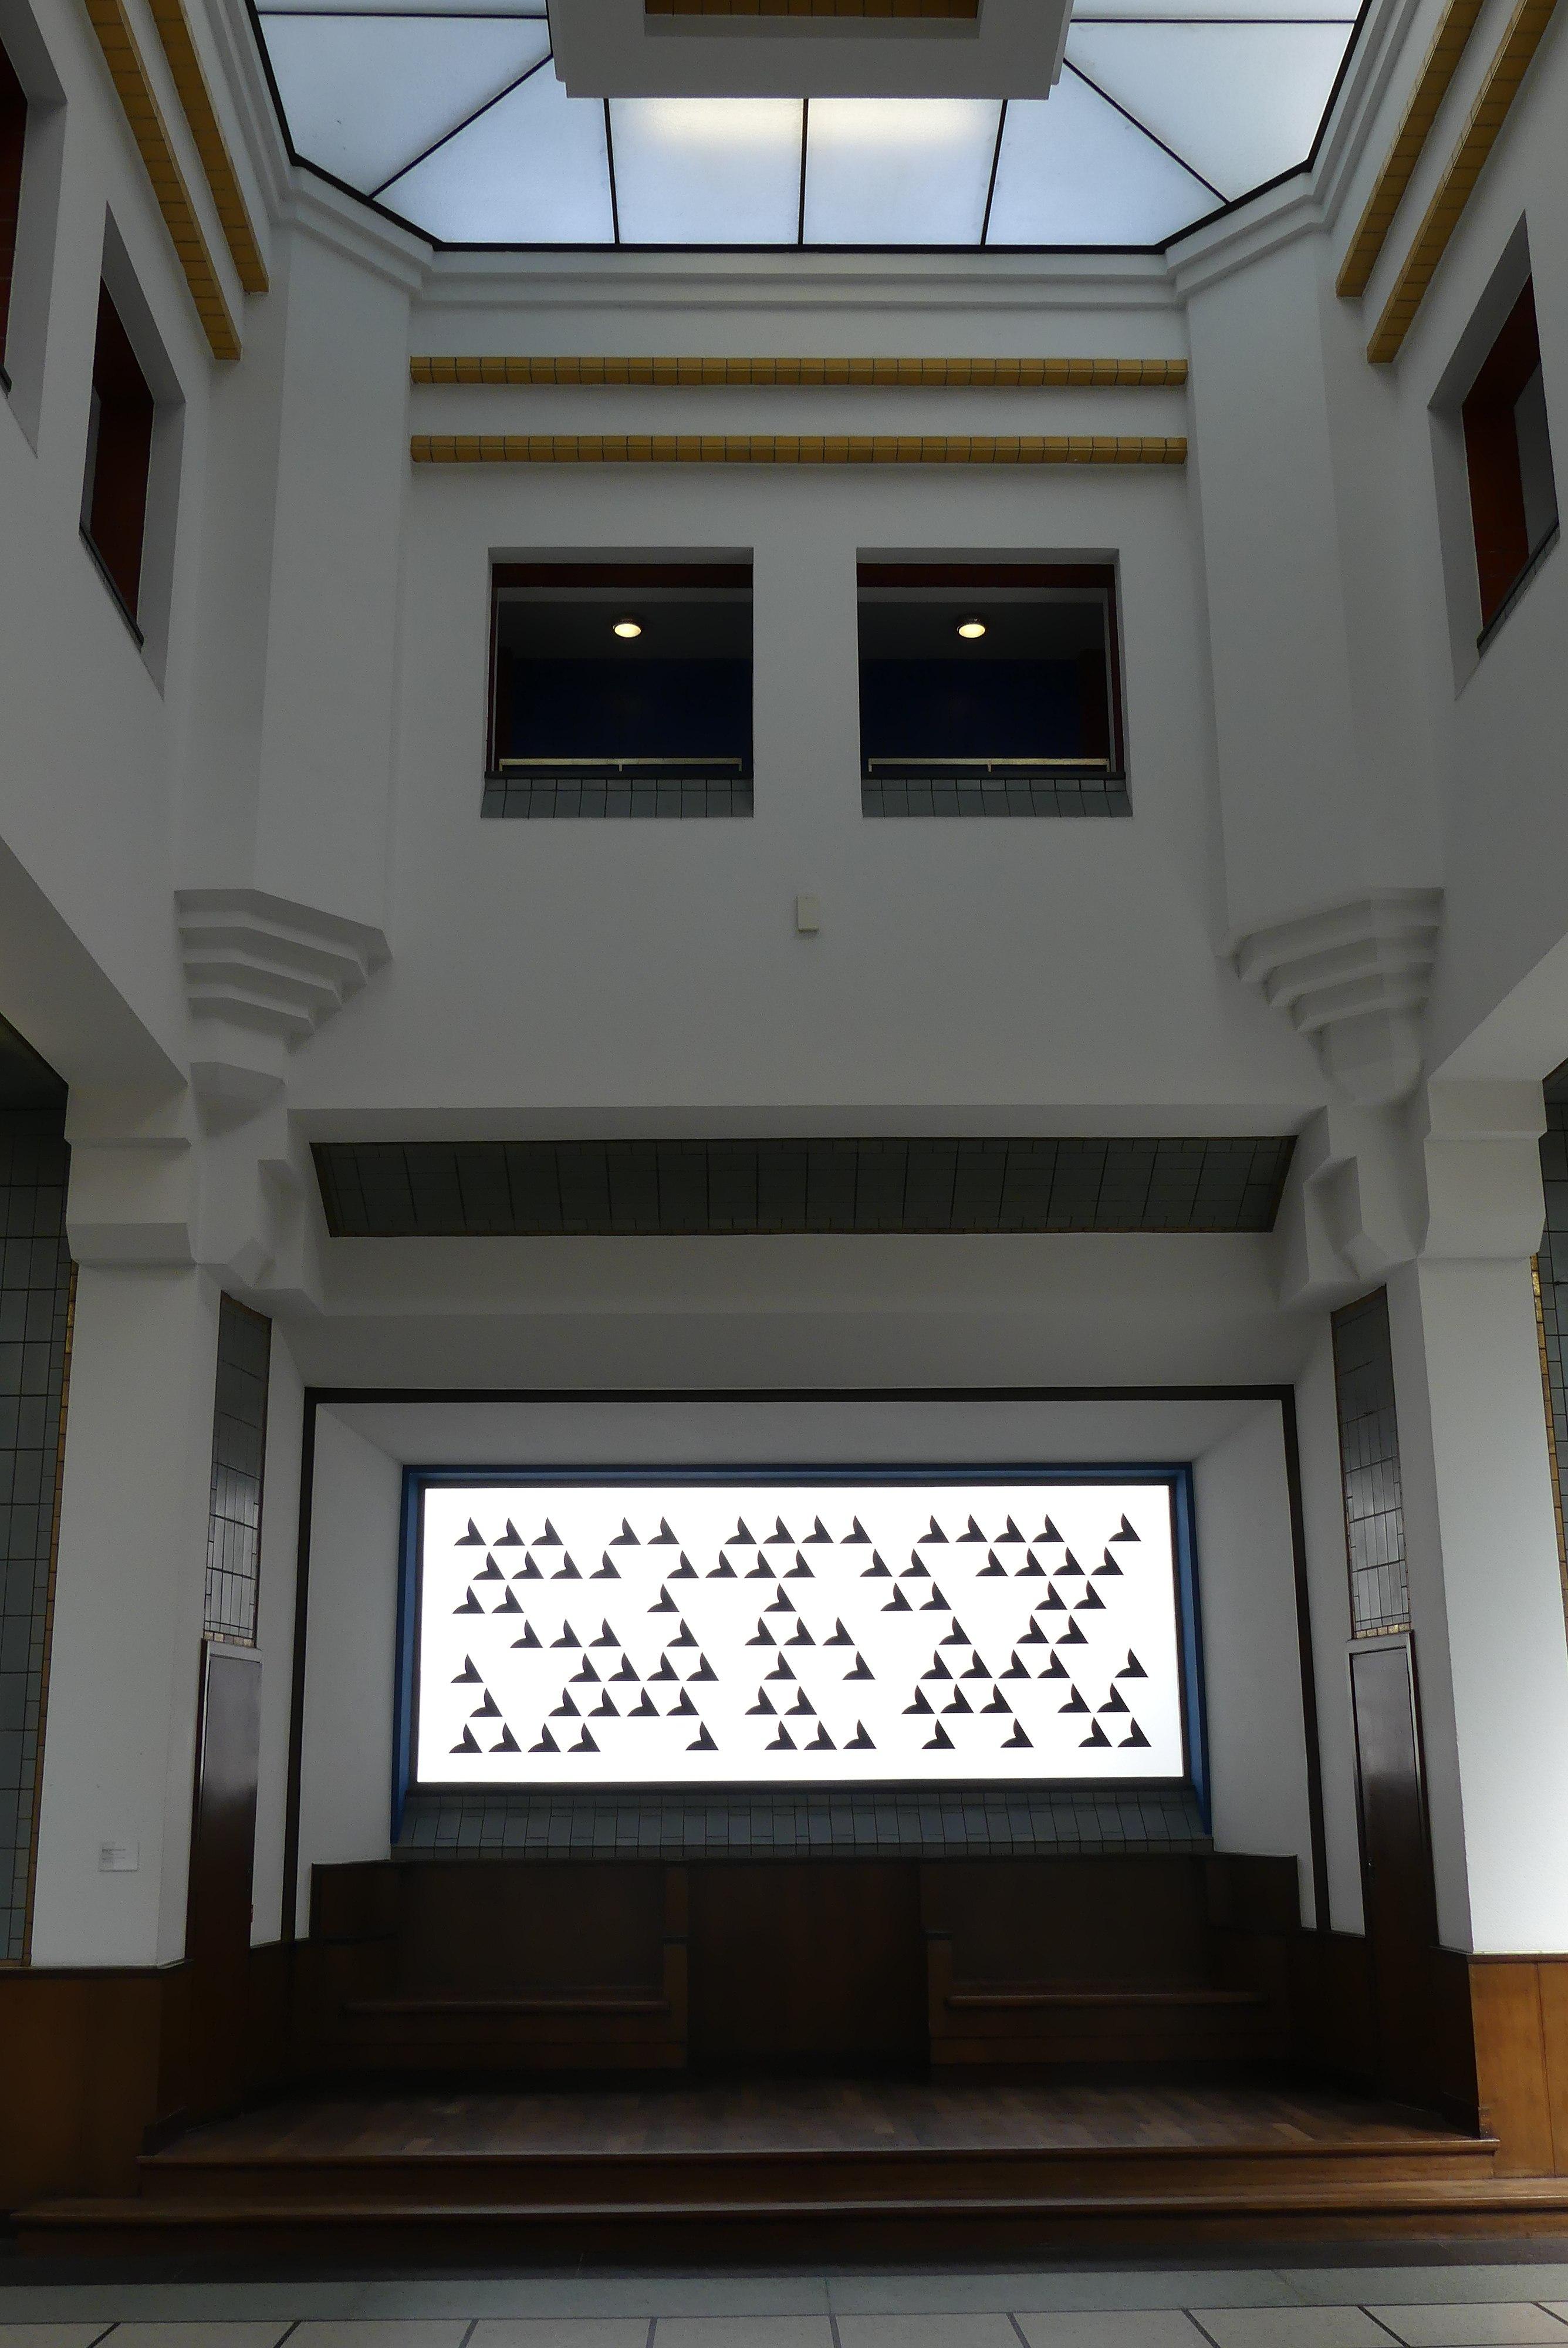 File:Interieur Gemeentemuseum Den Haag P1040976.jpg - Wikimedia Commons